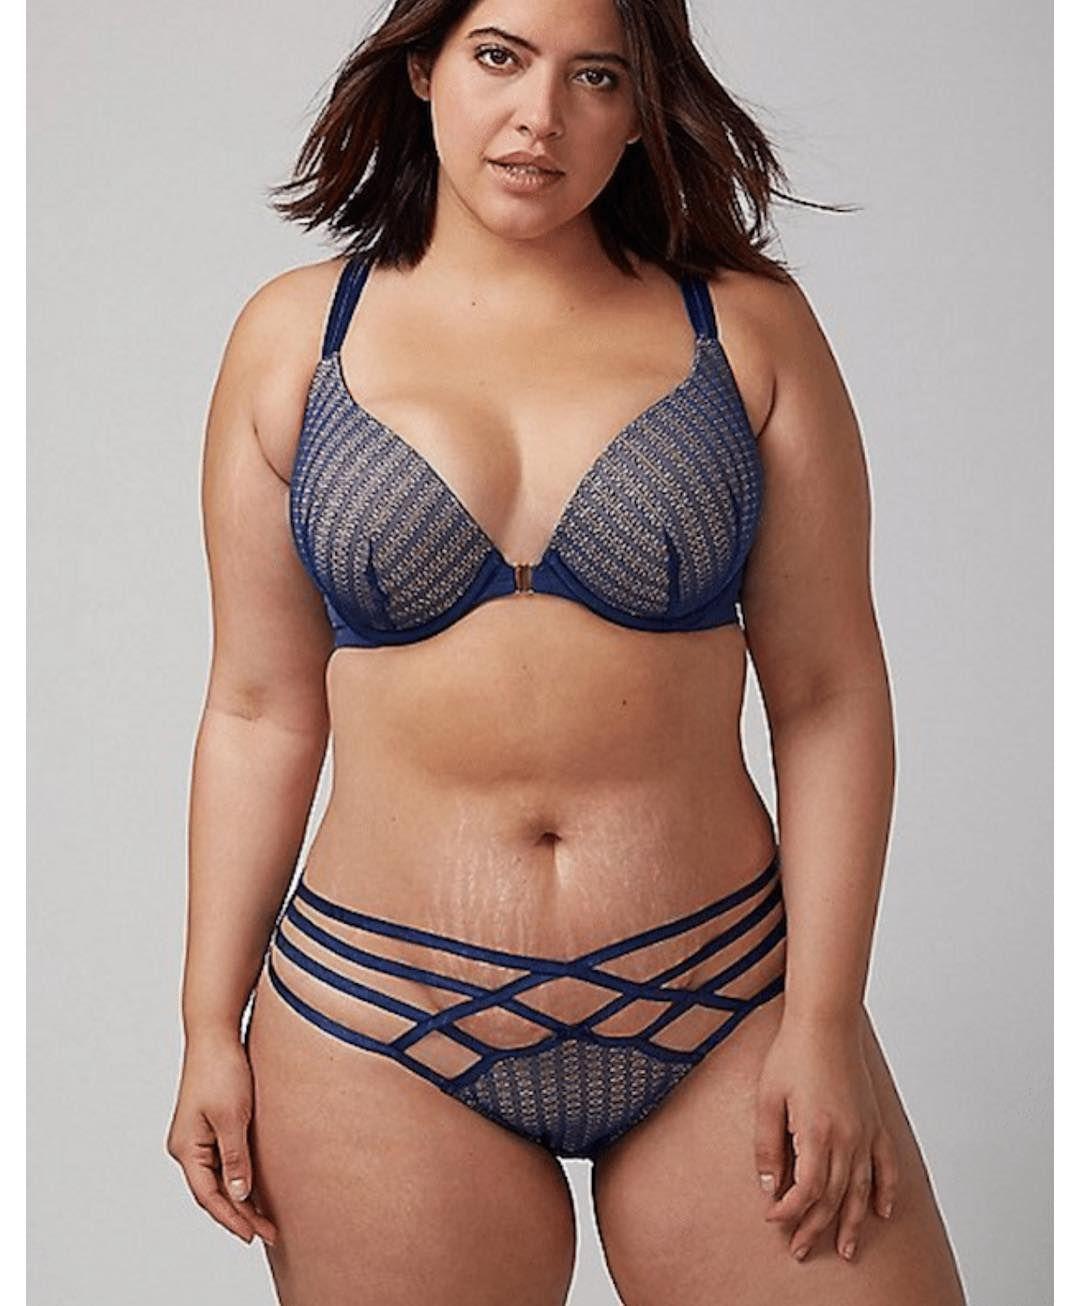 b6989b502b2 Denise Bidot Plus Size Girls